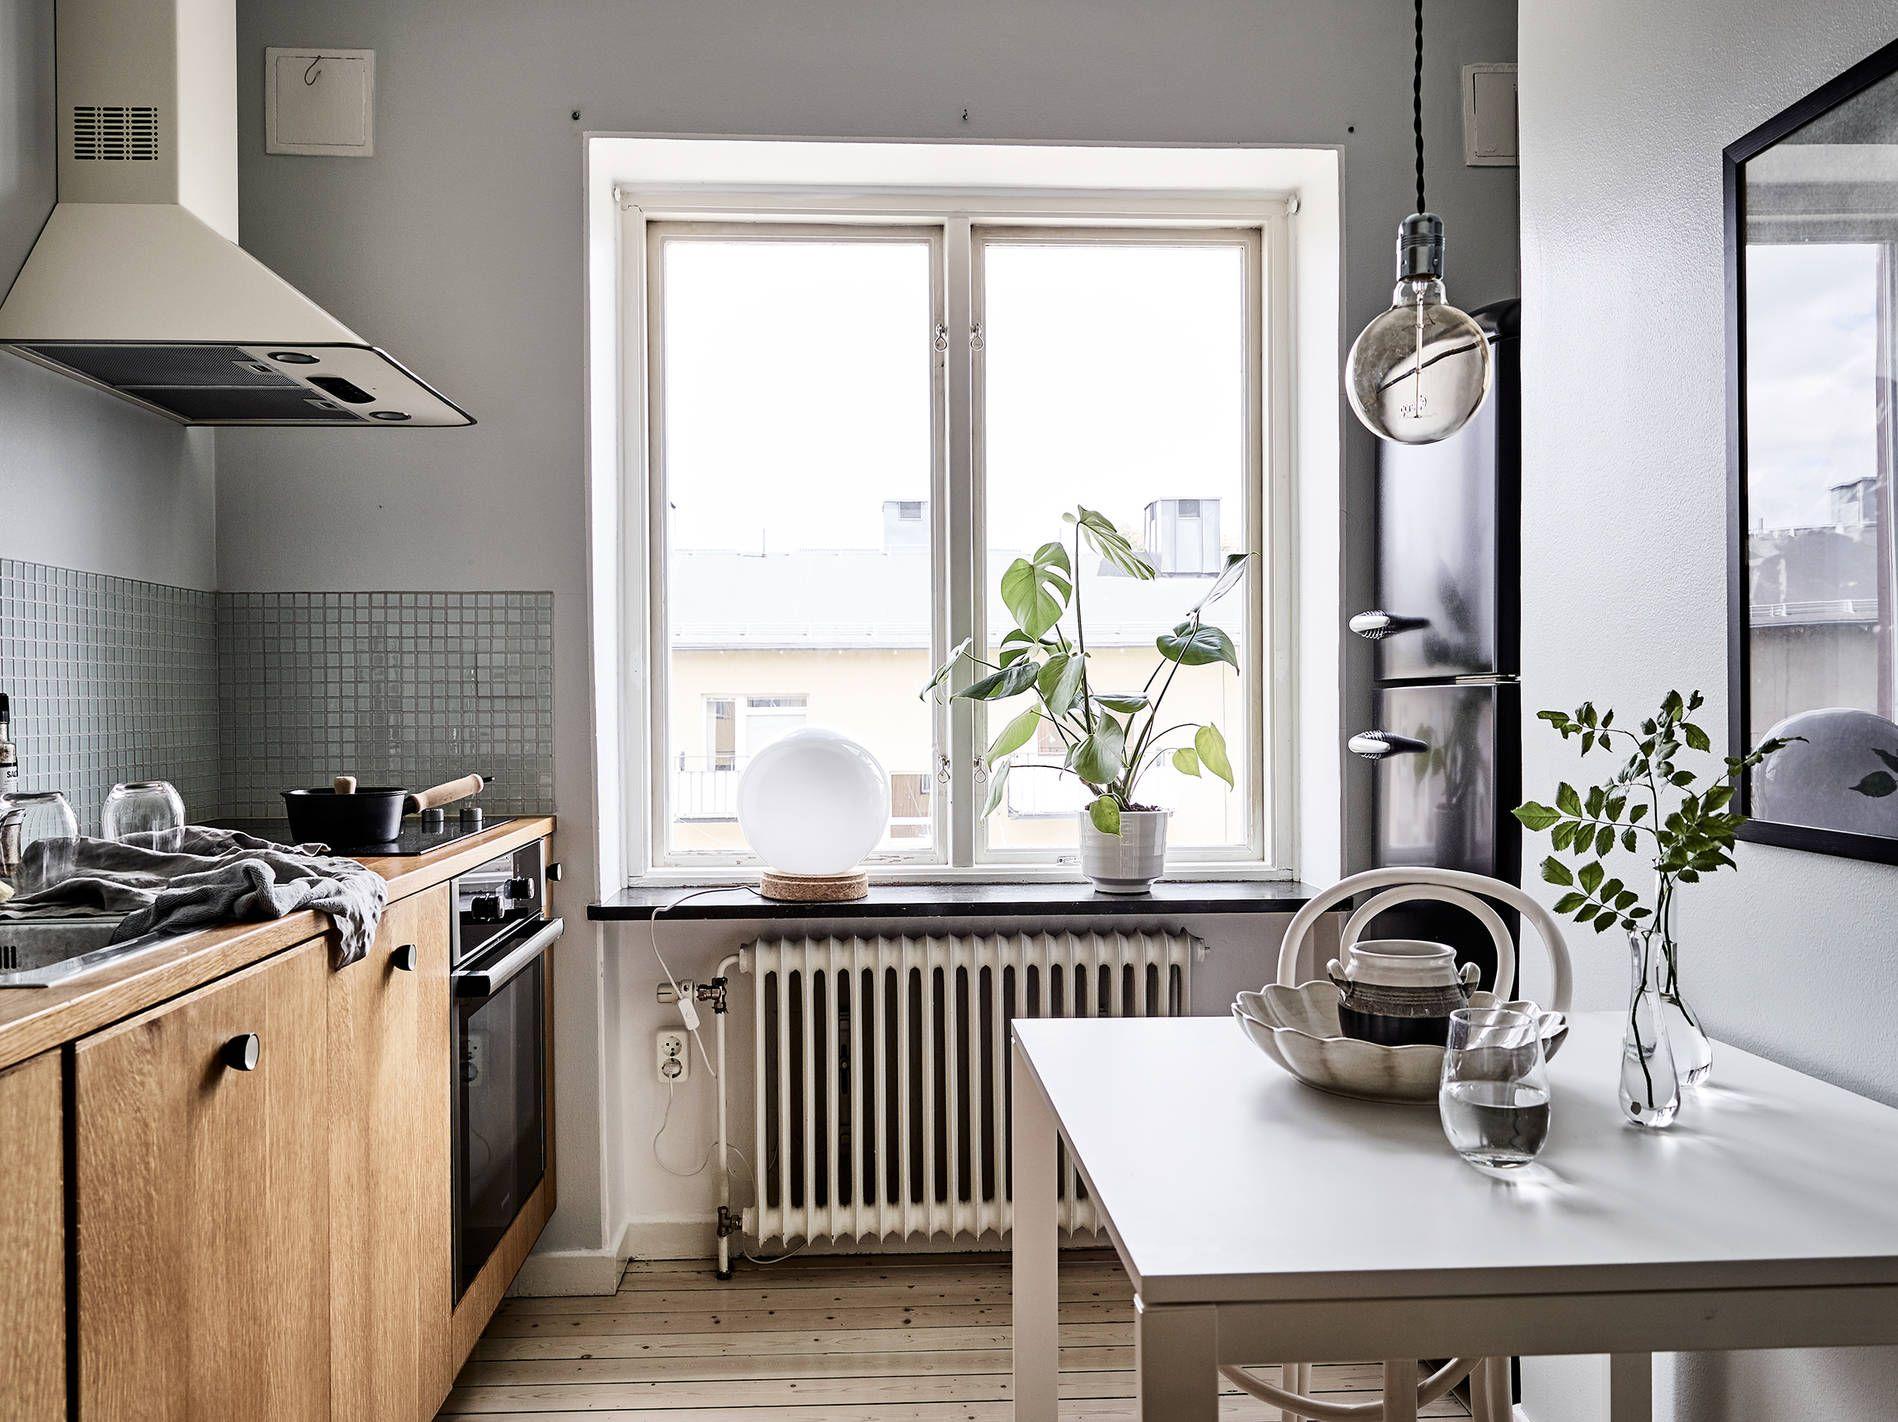 Wohnzimmerfliesen an der wand sergelsgatan  c  stadshem  kitchens  pinterest